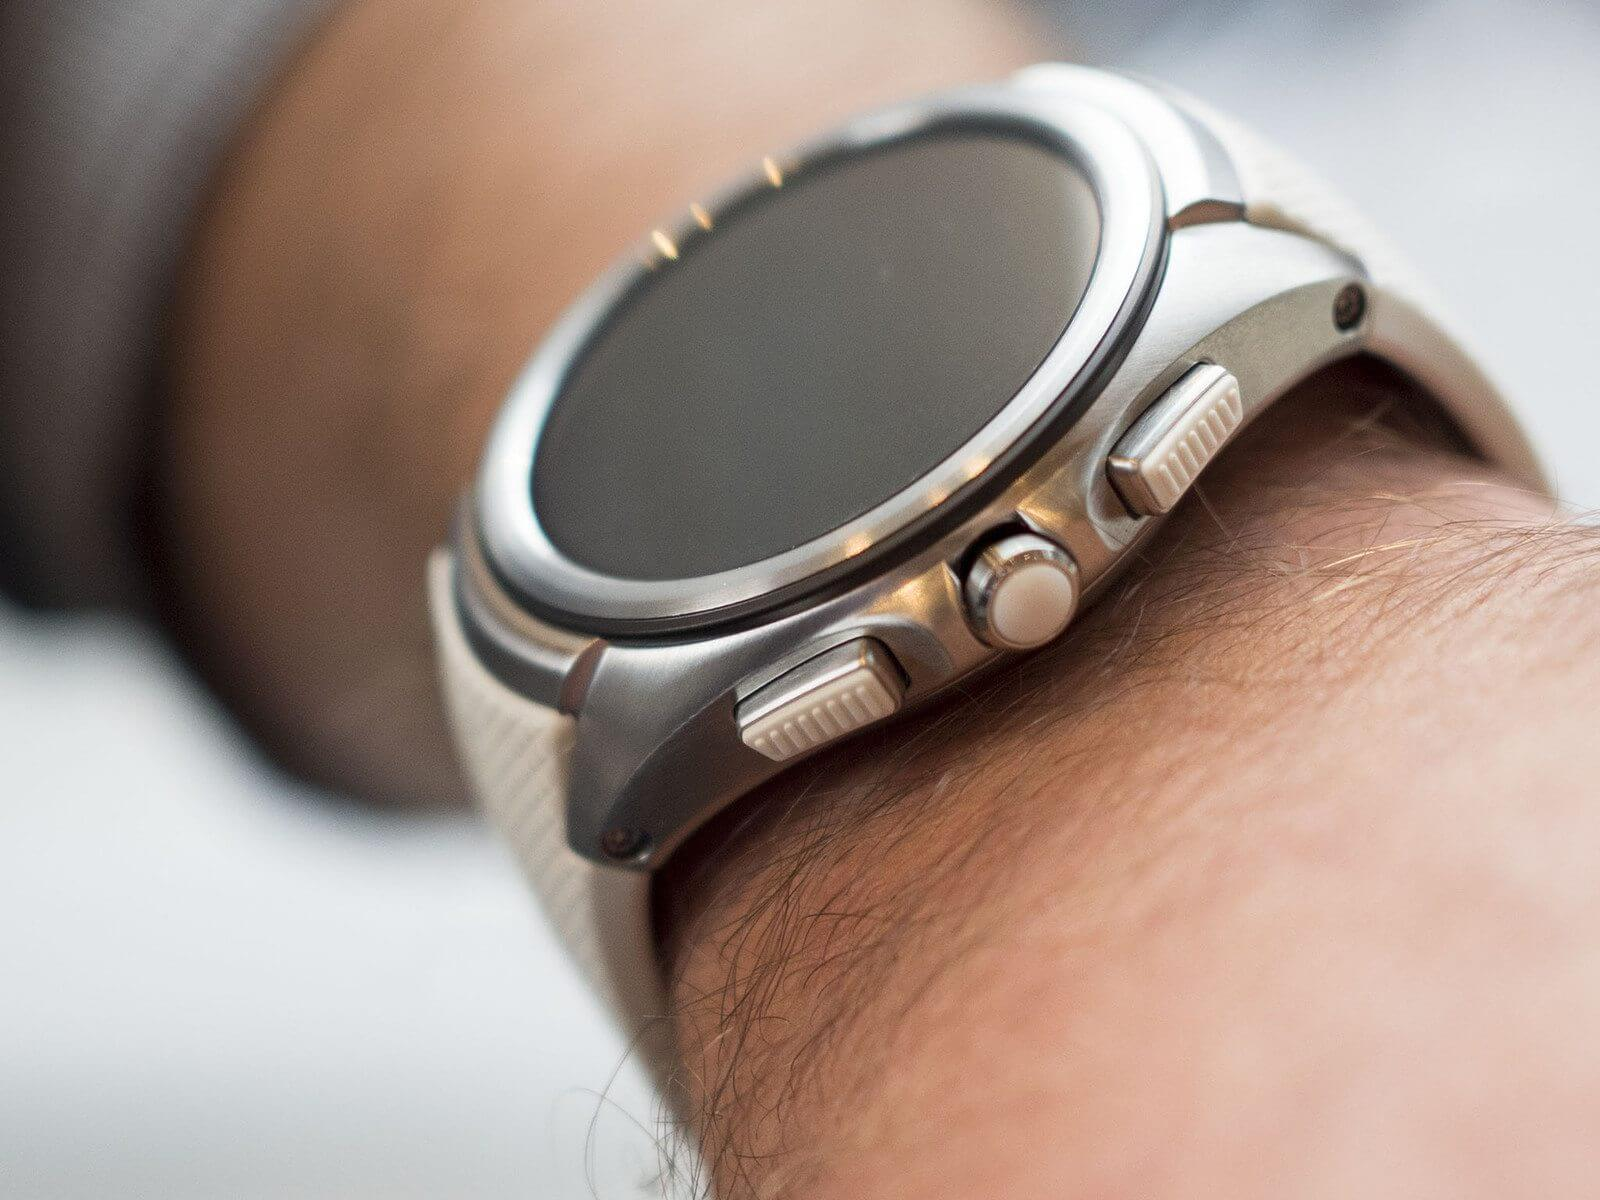 smt lgwatchurbanelte capa - LG Watch Urbane 2 tem lançamento mundial cancelado